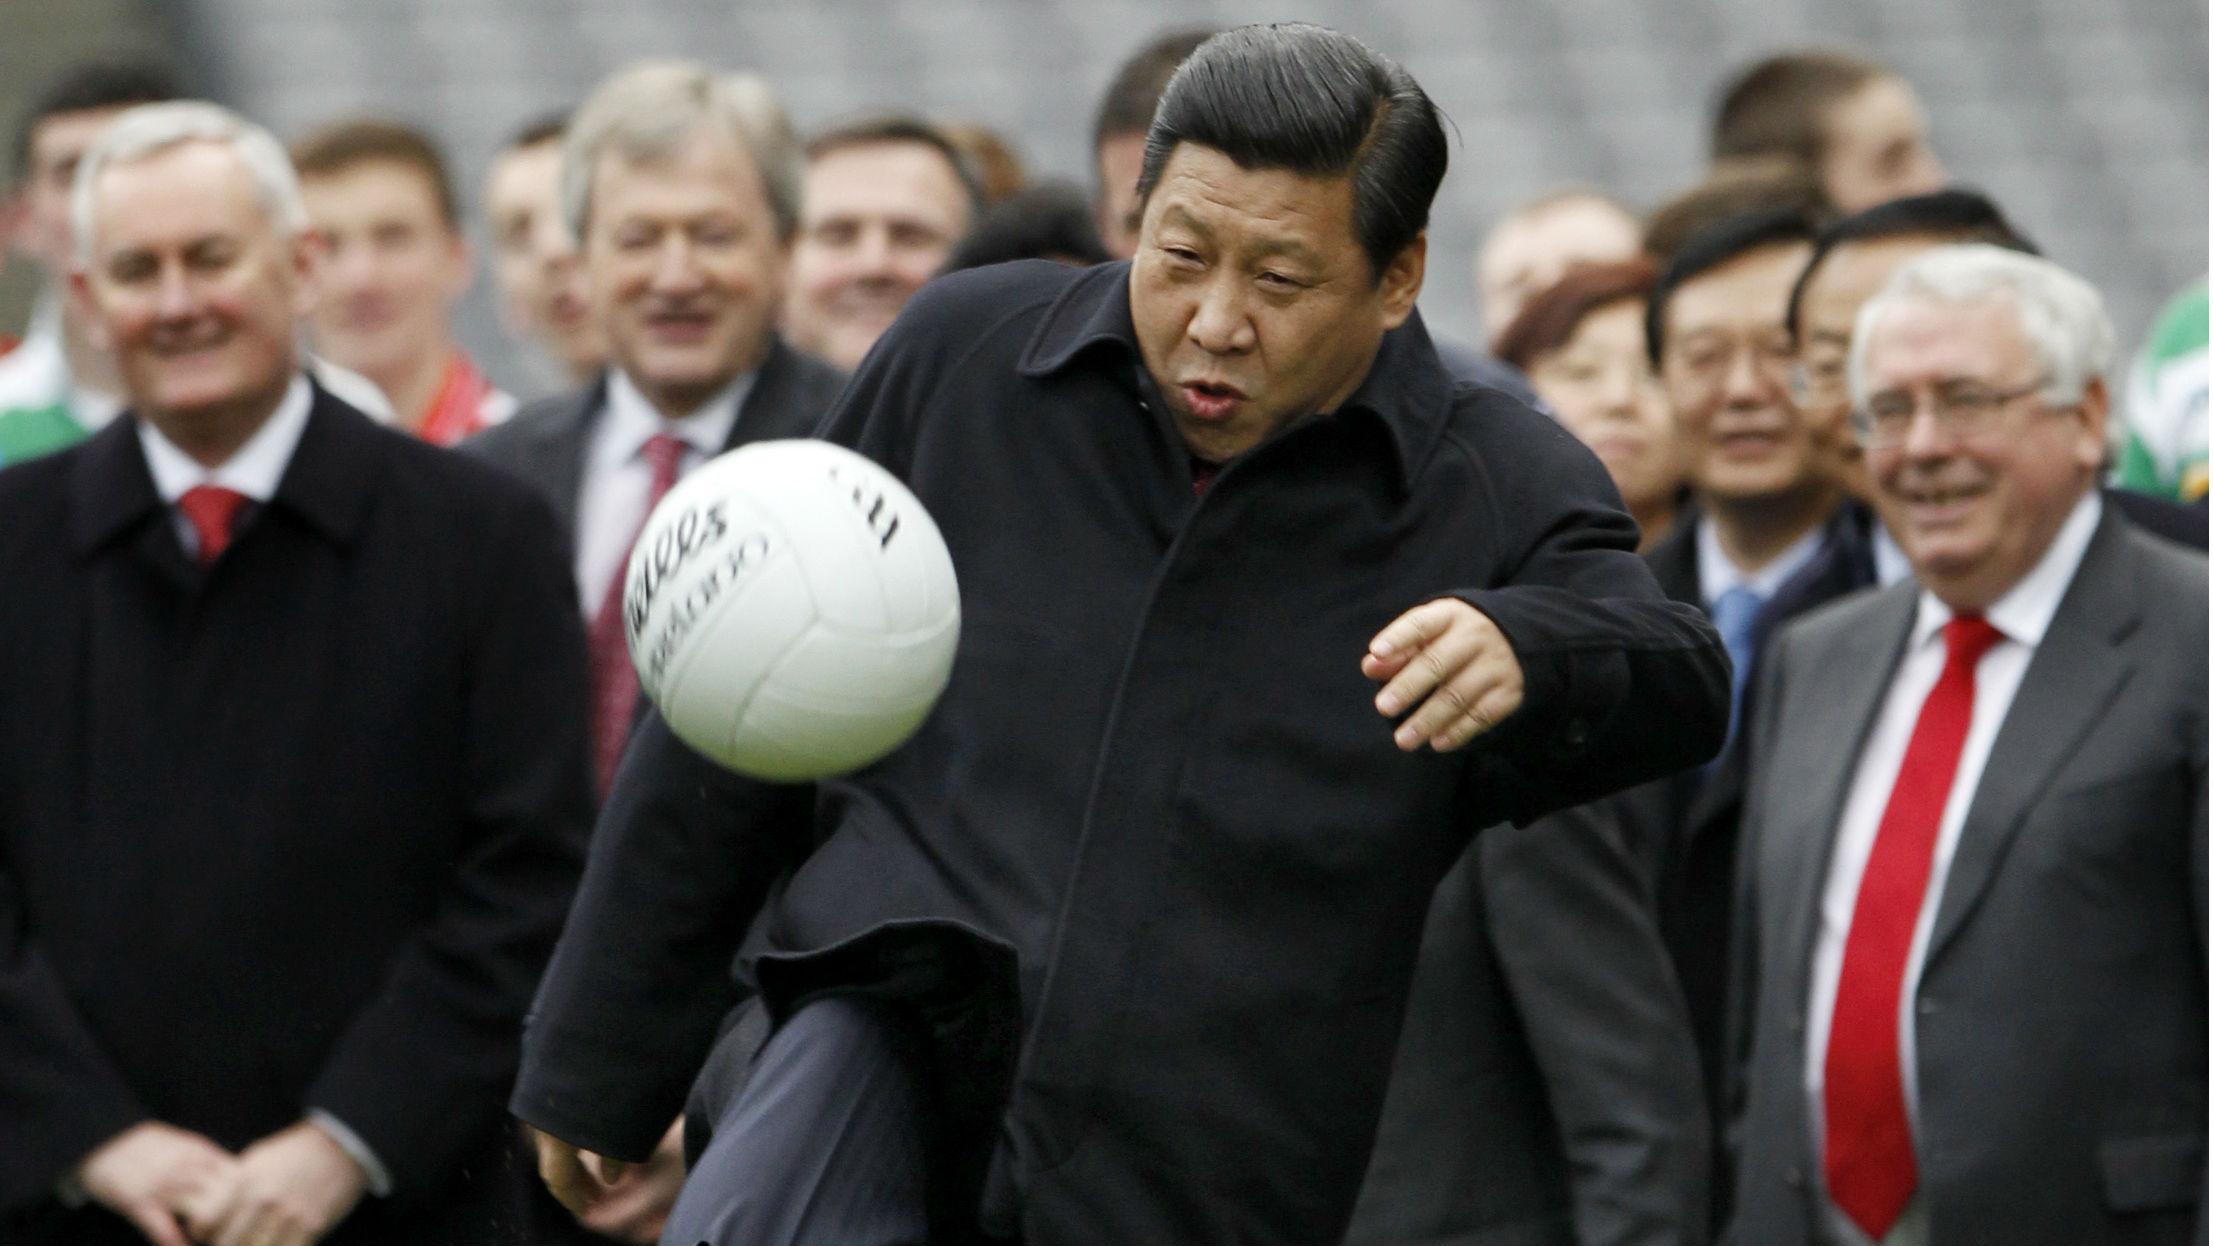 China's Vice-President Xi Jinping kicks a football during a visit to Croke Park in Dublin, Ireland February 19, 2012. REUTERS/David Moir